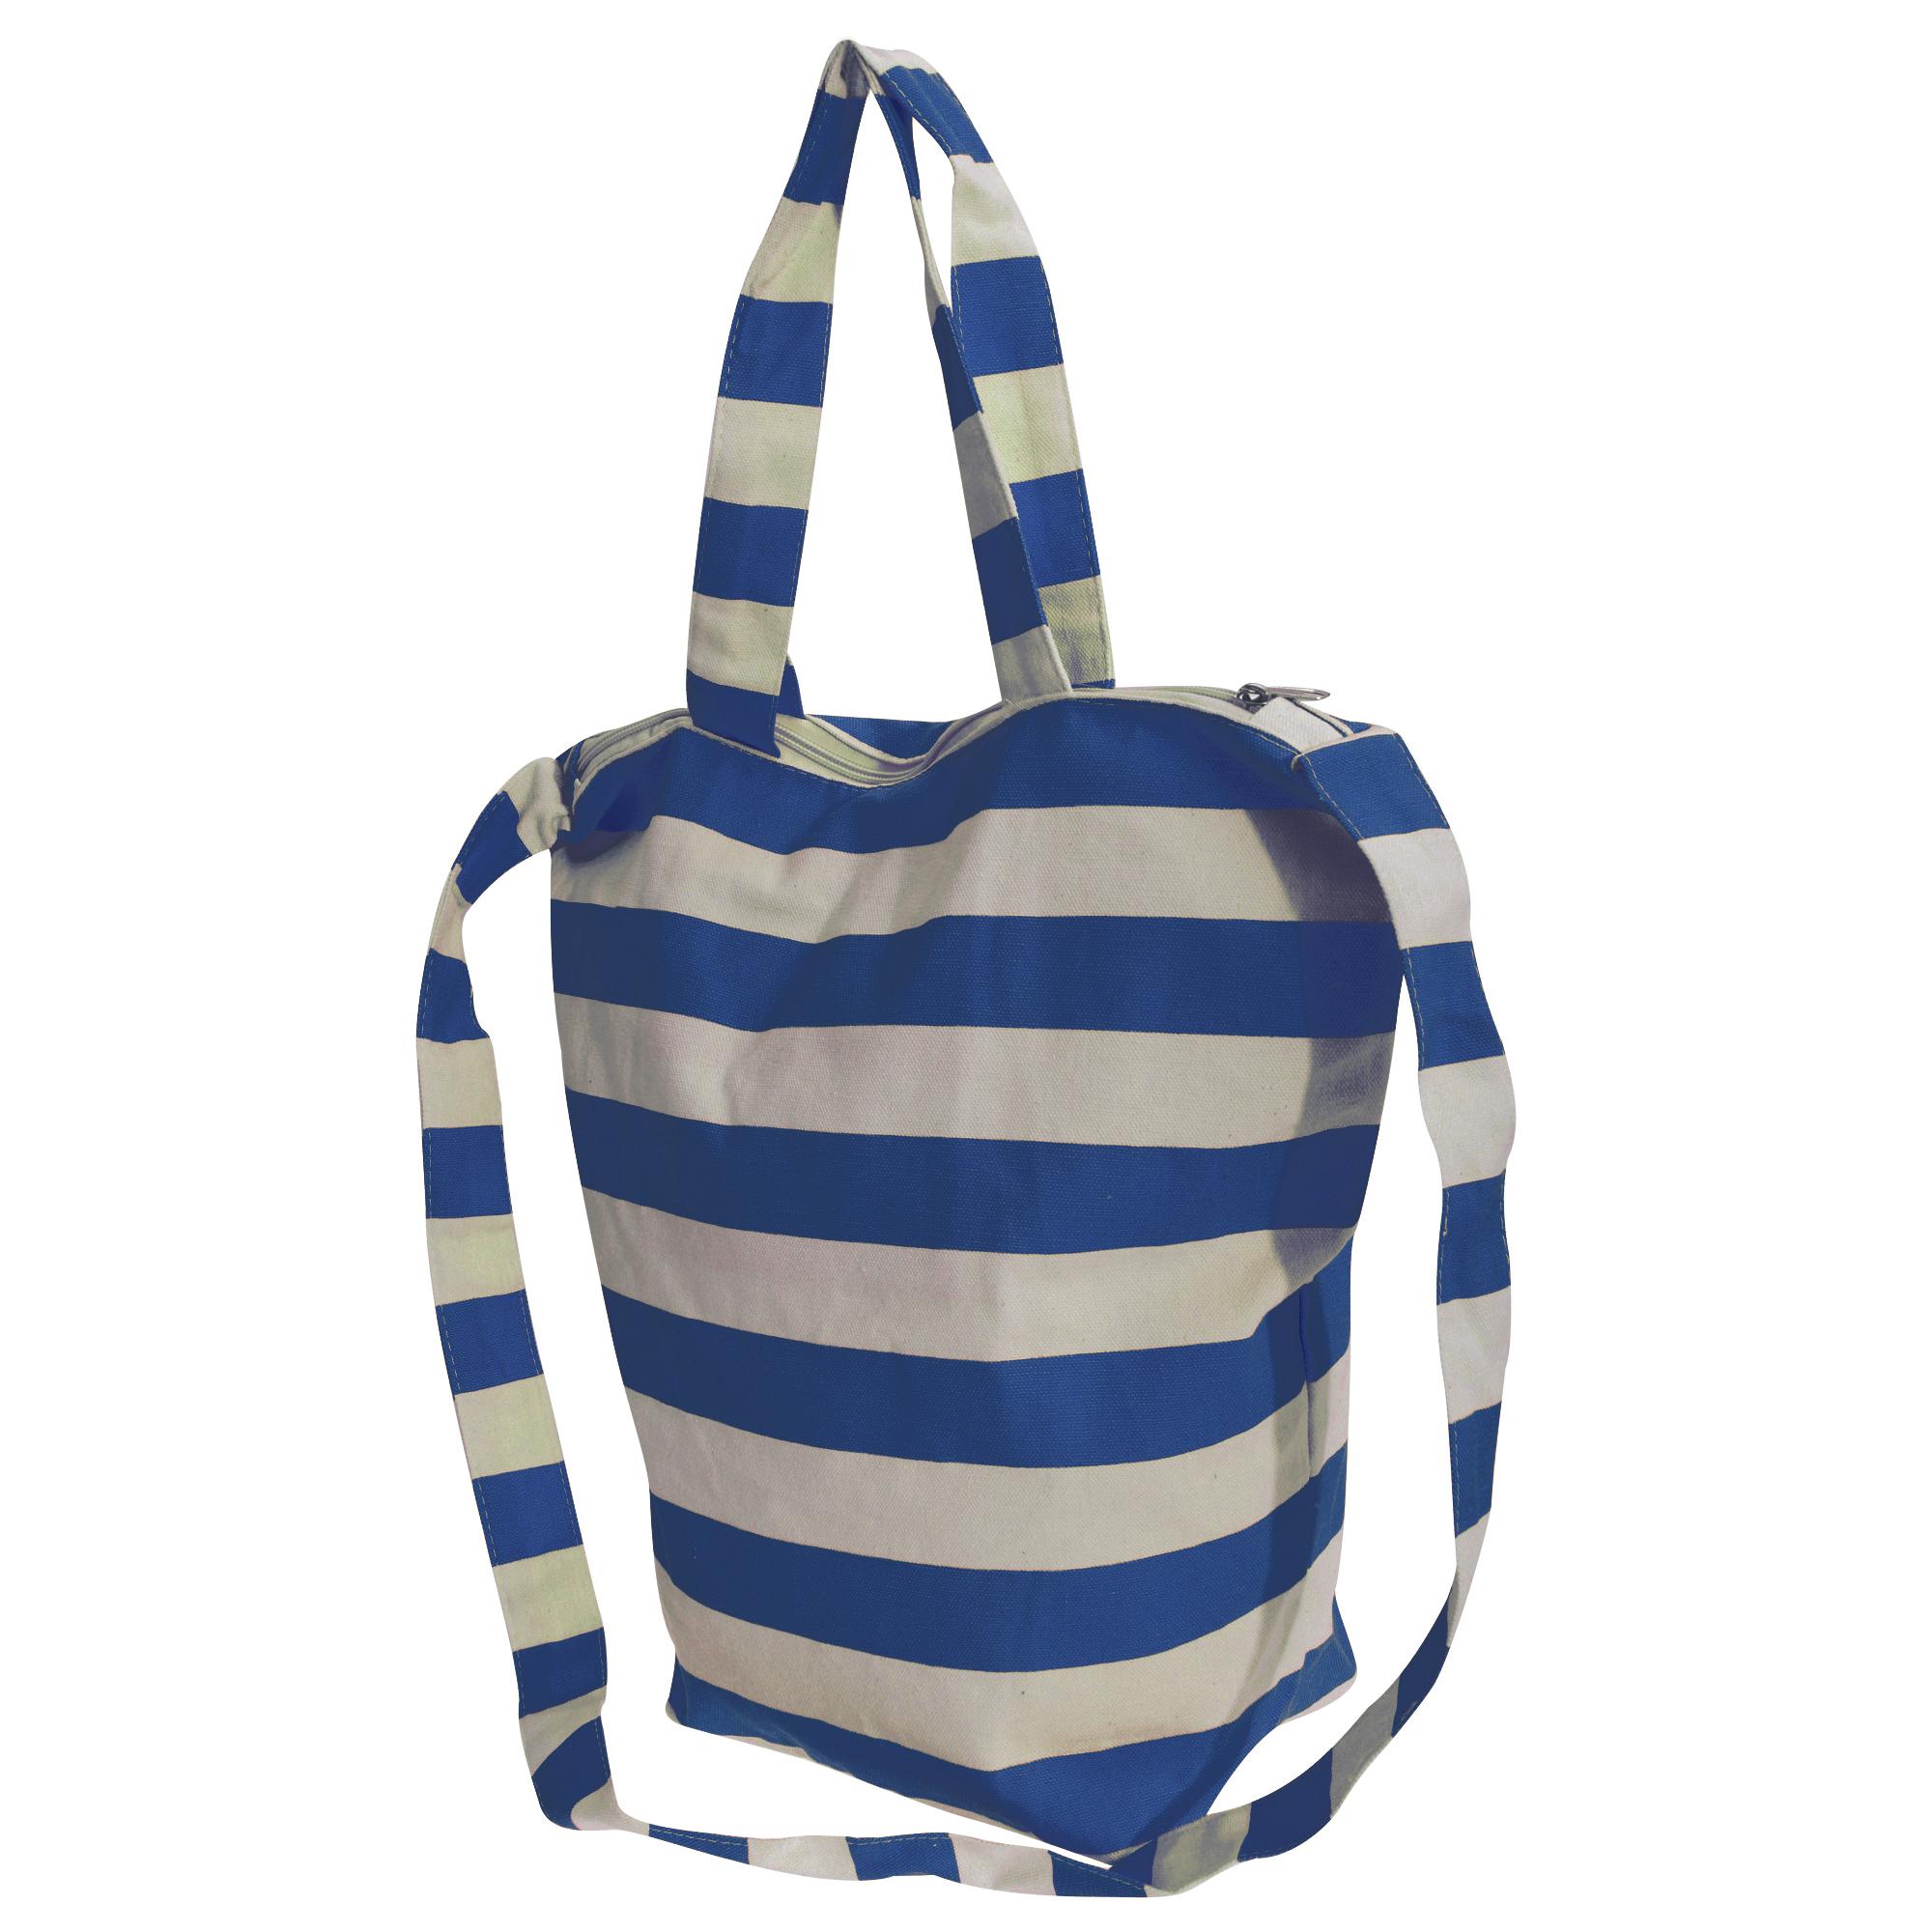 FLOSO Womens/Ladies Striped Summer Handbag With Shoulder Strap (One Size) (White/Navy)